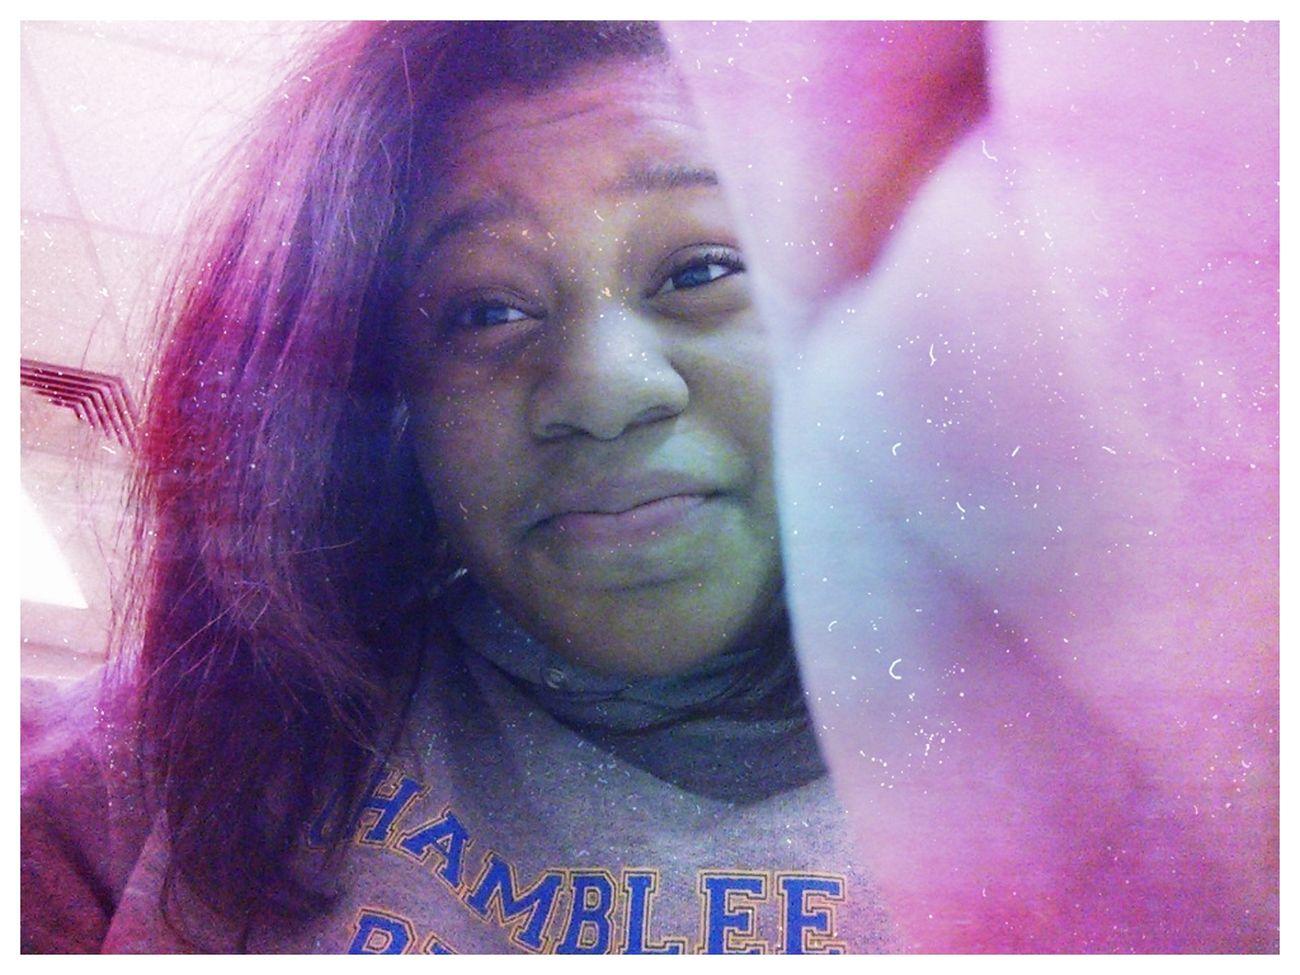 Bored N School